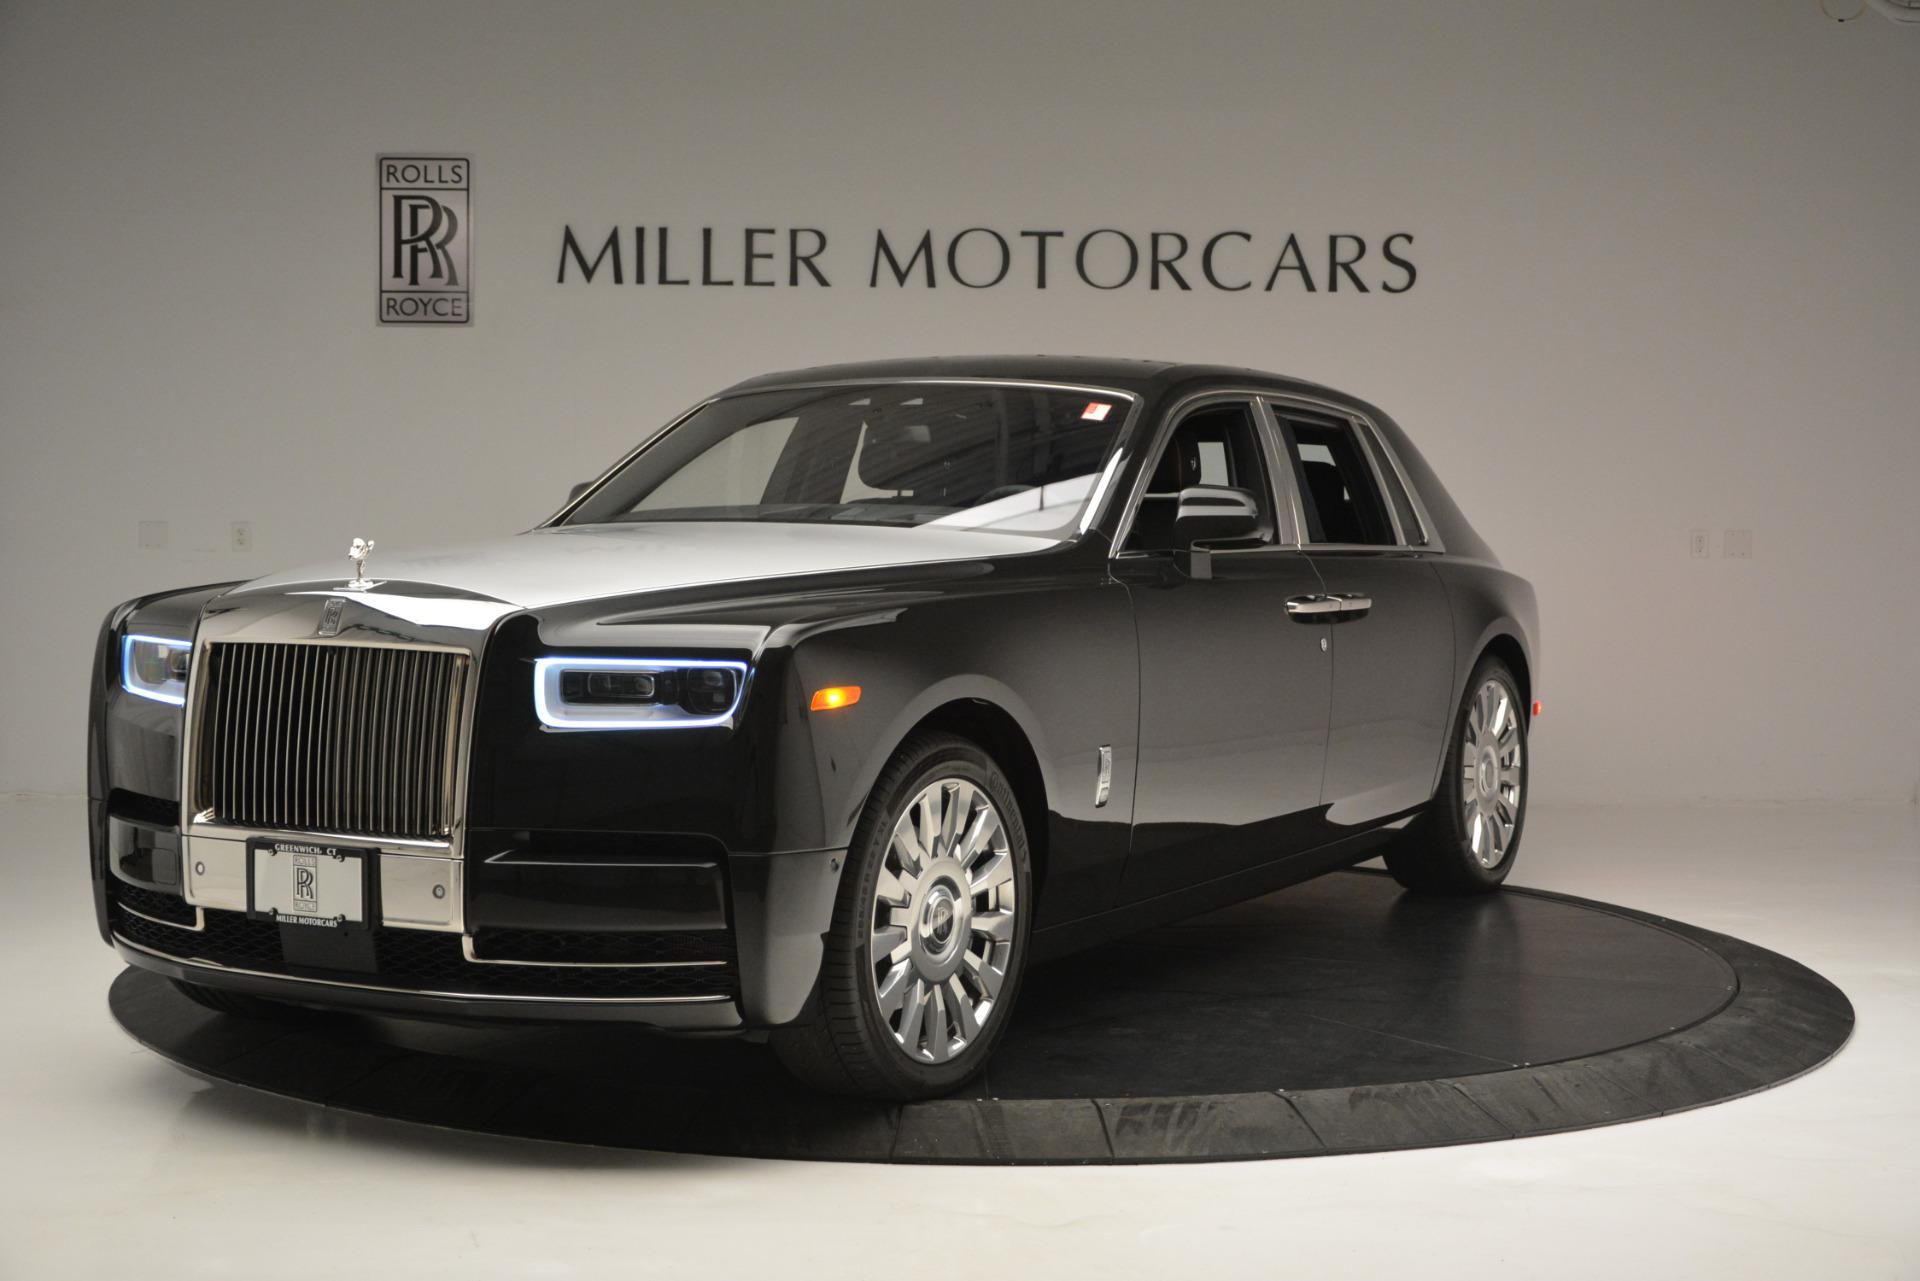 Used 2018 Rolls-Royce Phantom for sale Sold at Bugatti of Greenwich in Greenwich CT 06830 1